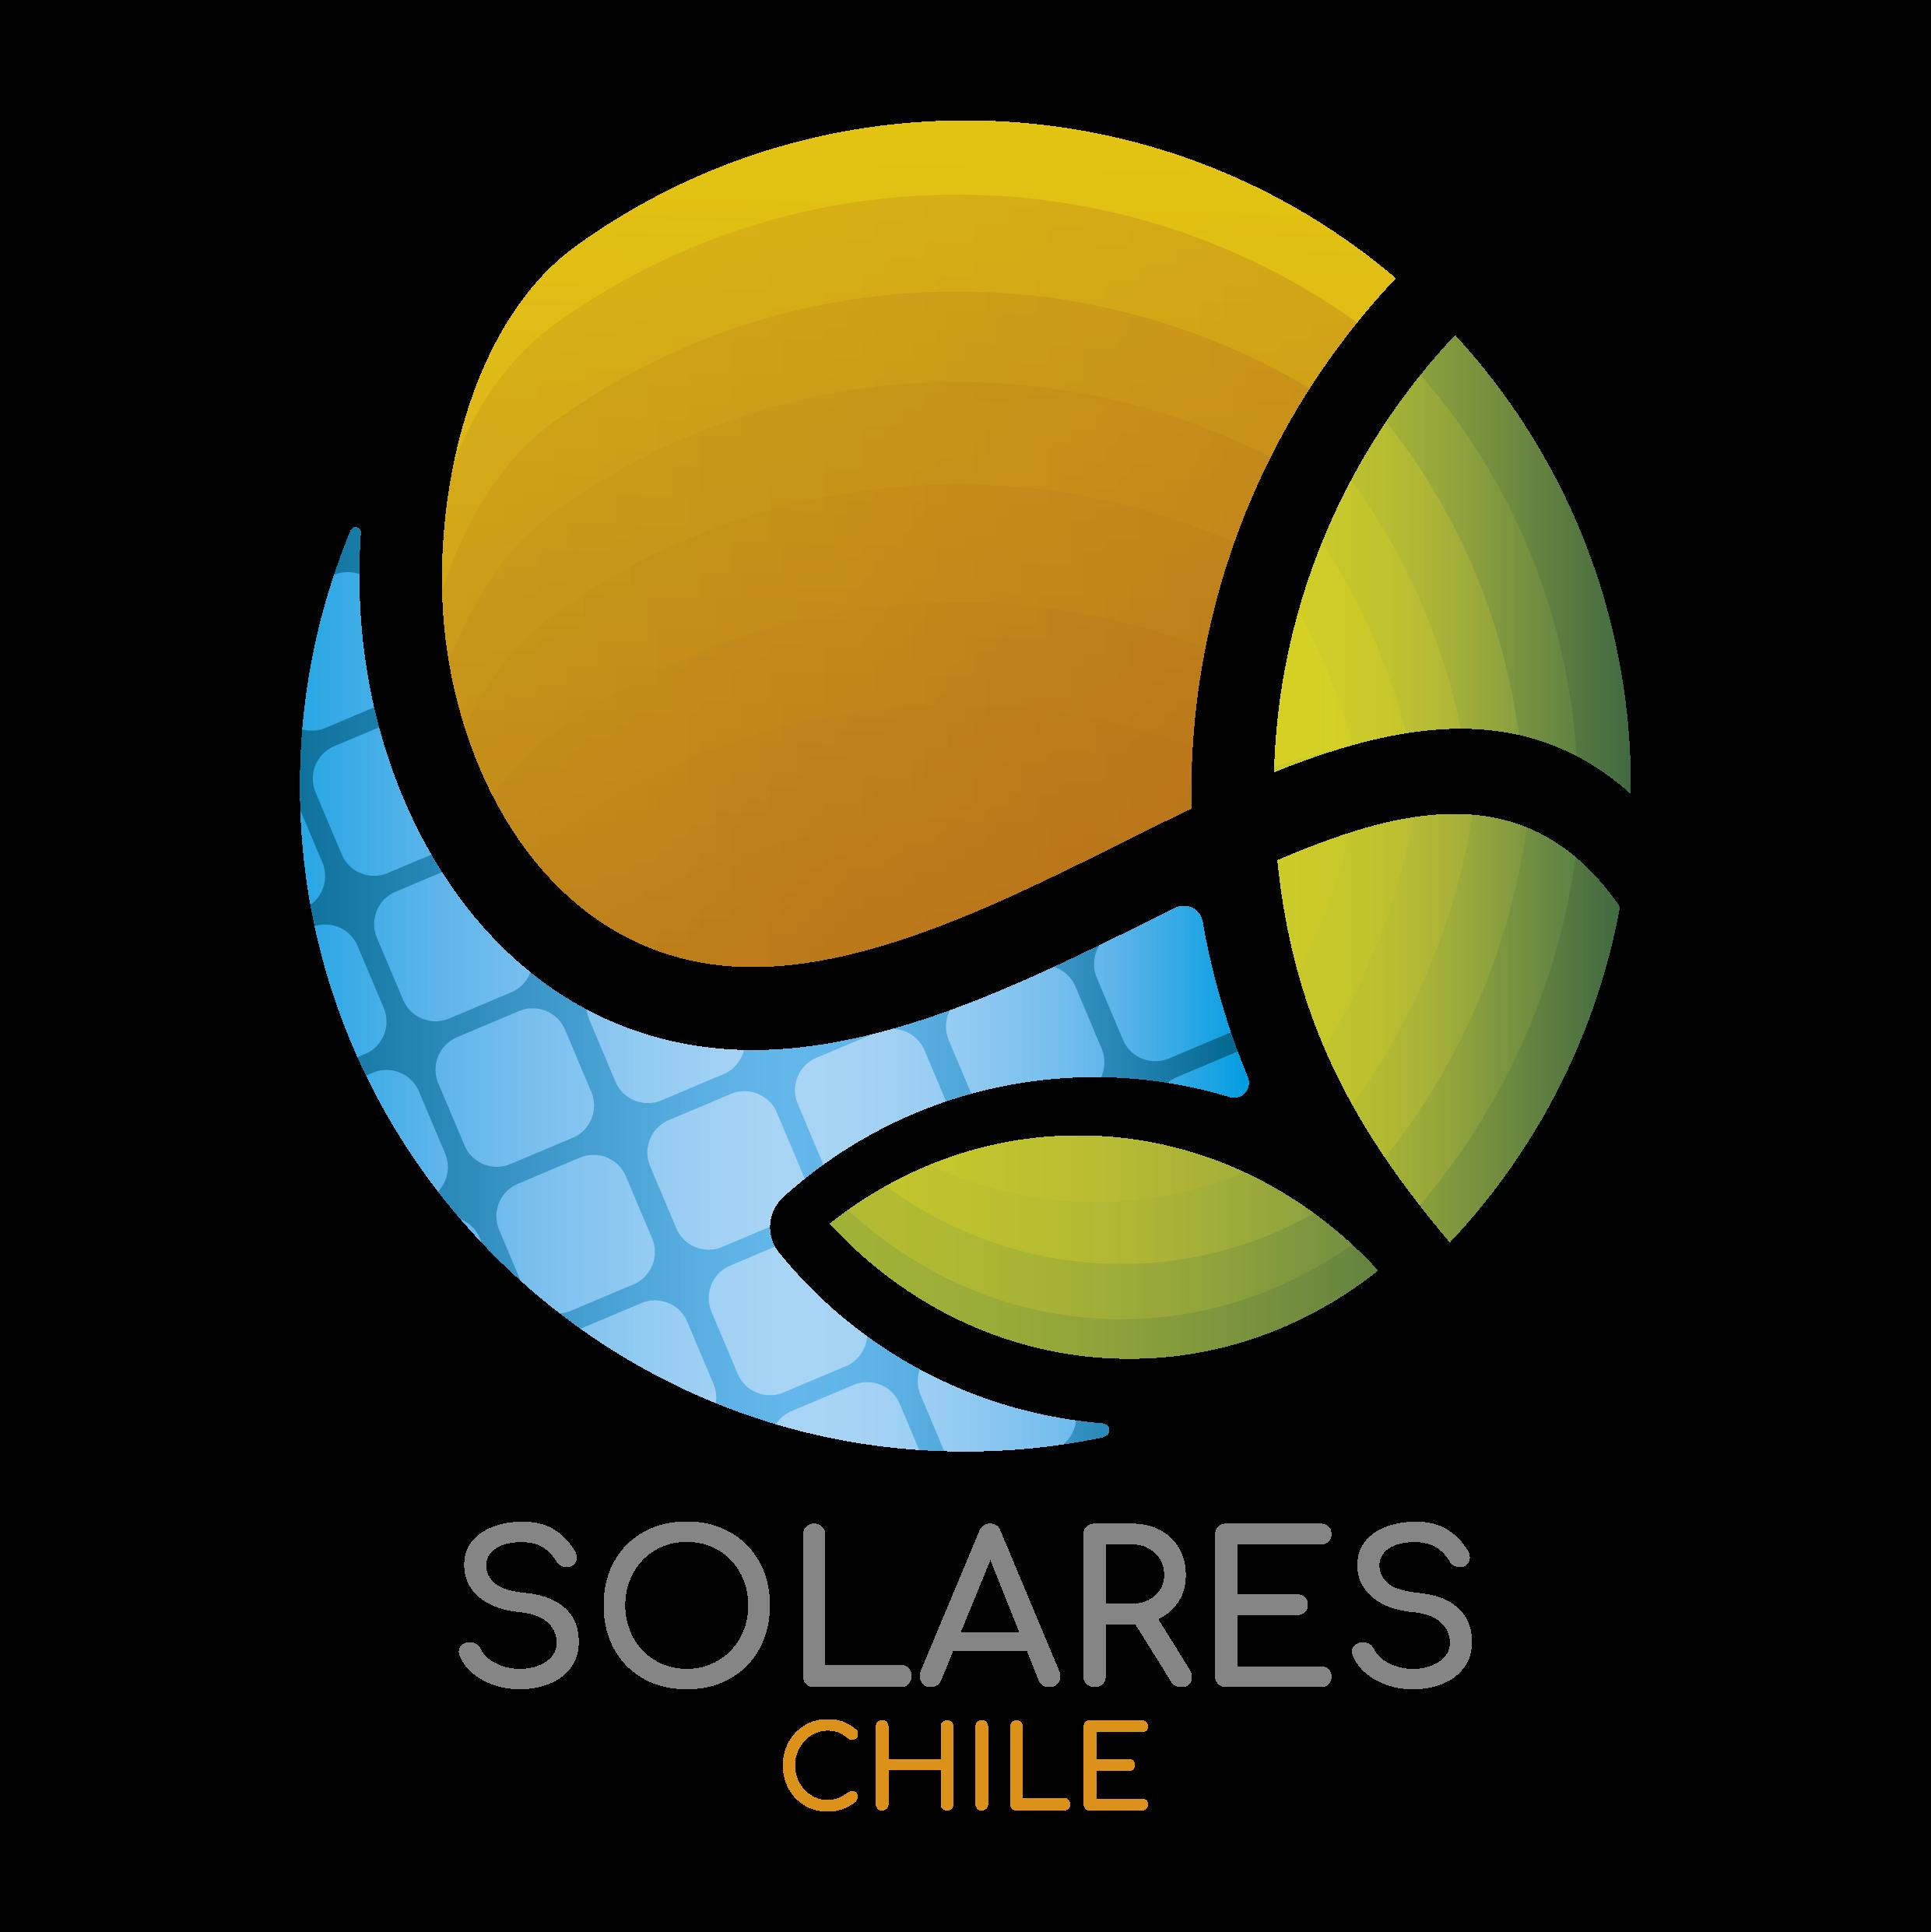 Solares Chile Paneles Solares Instalaci 243 N Sst